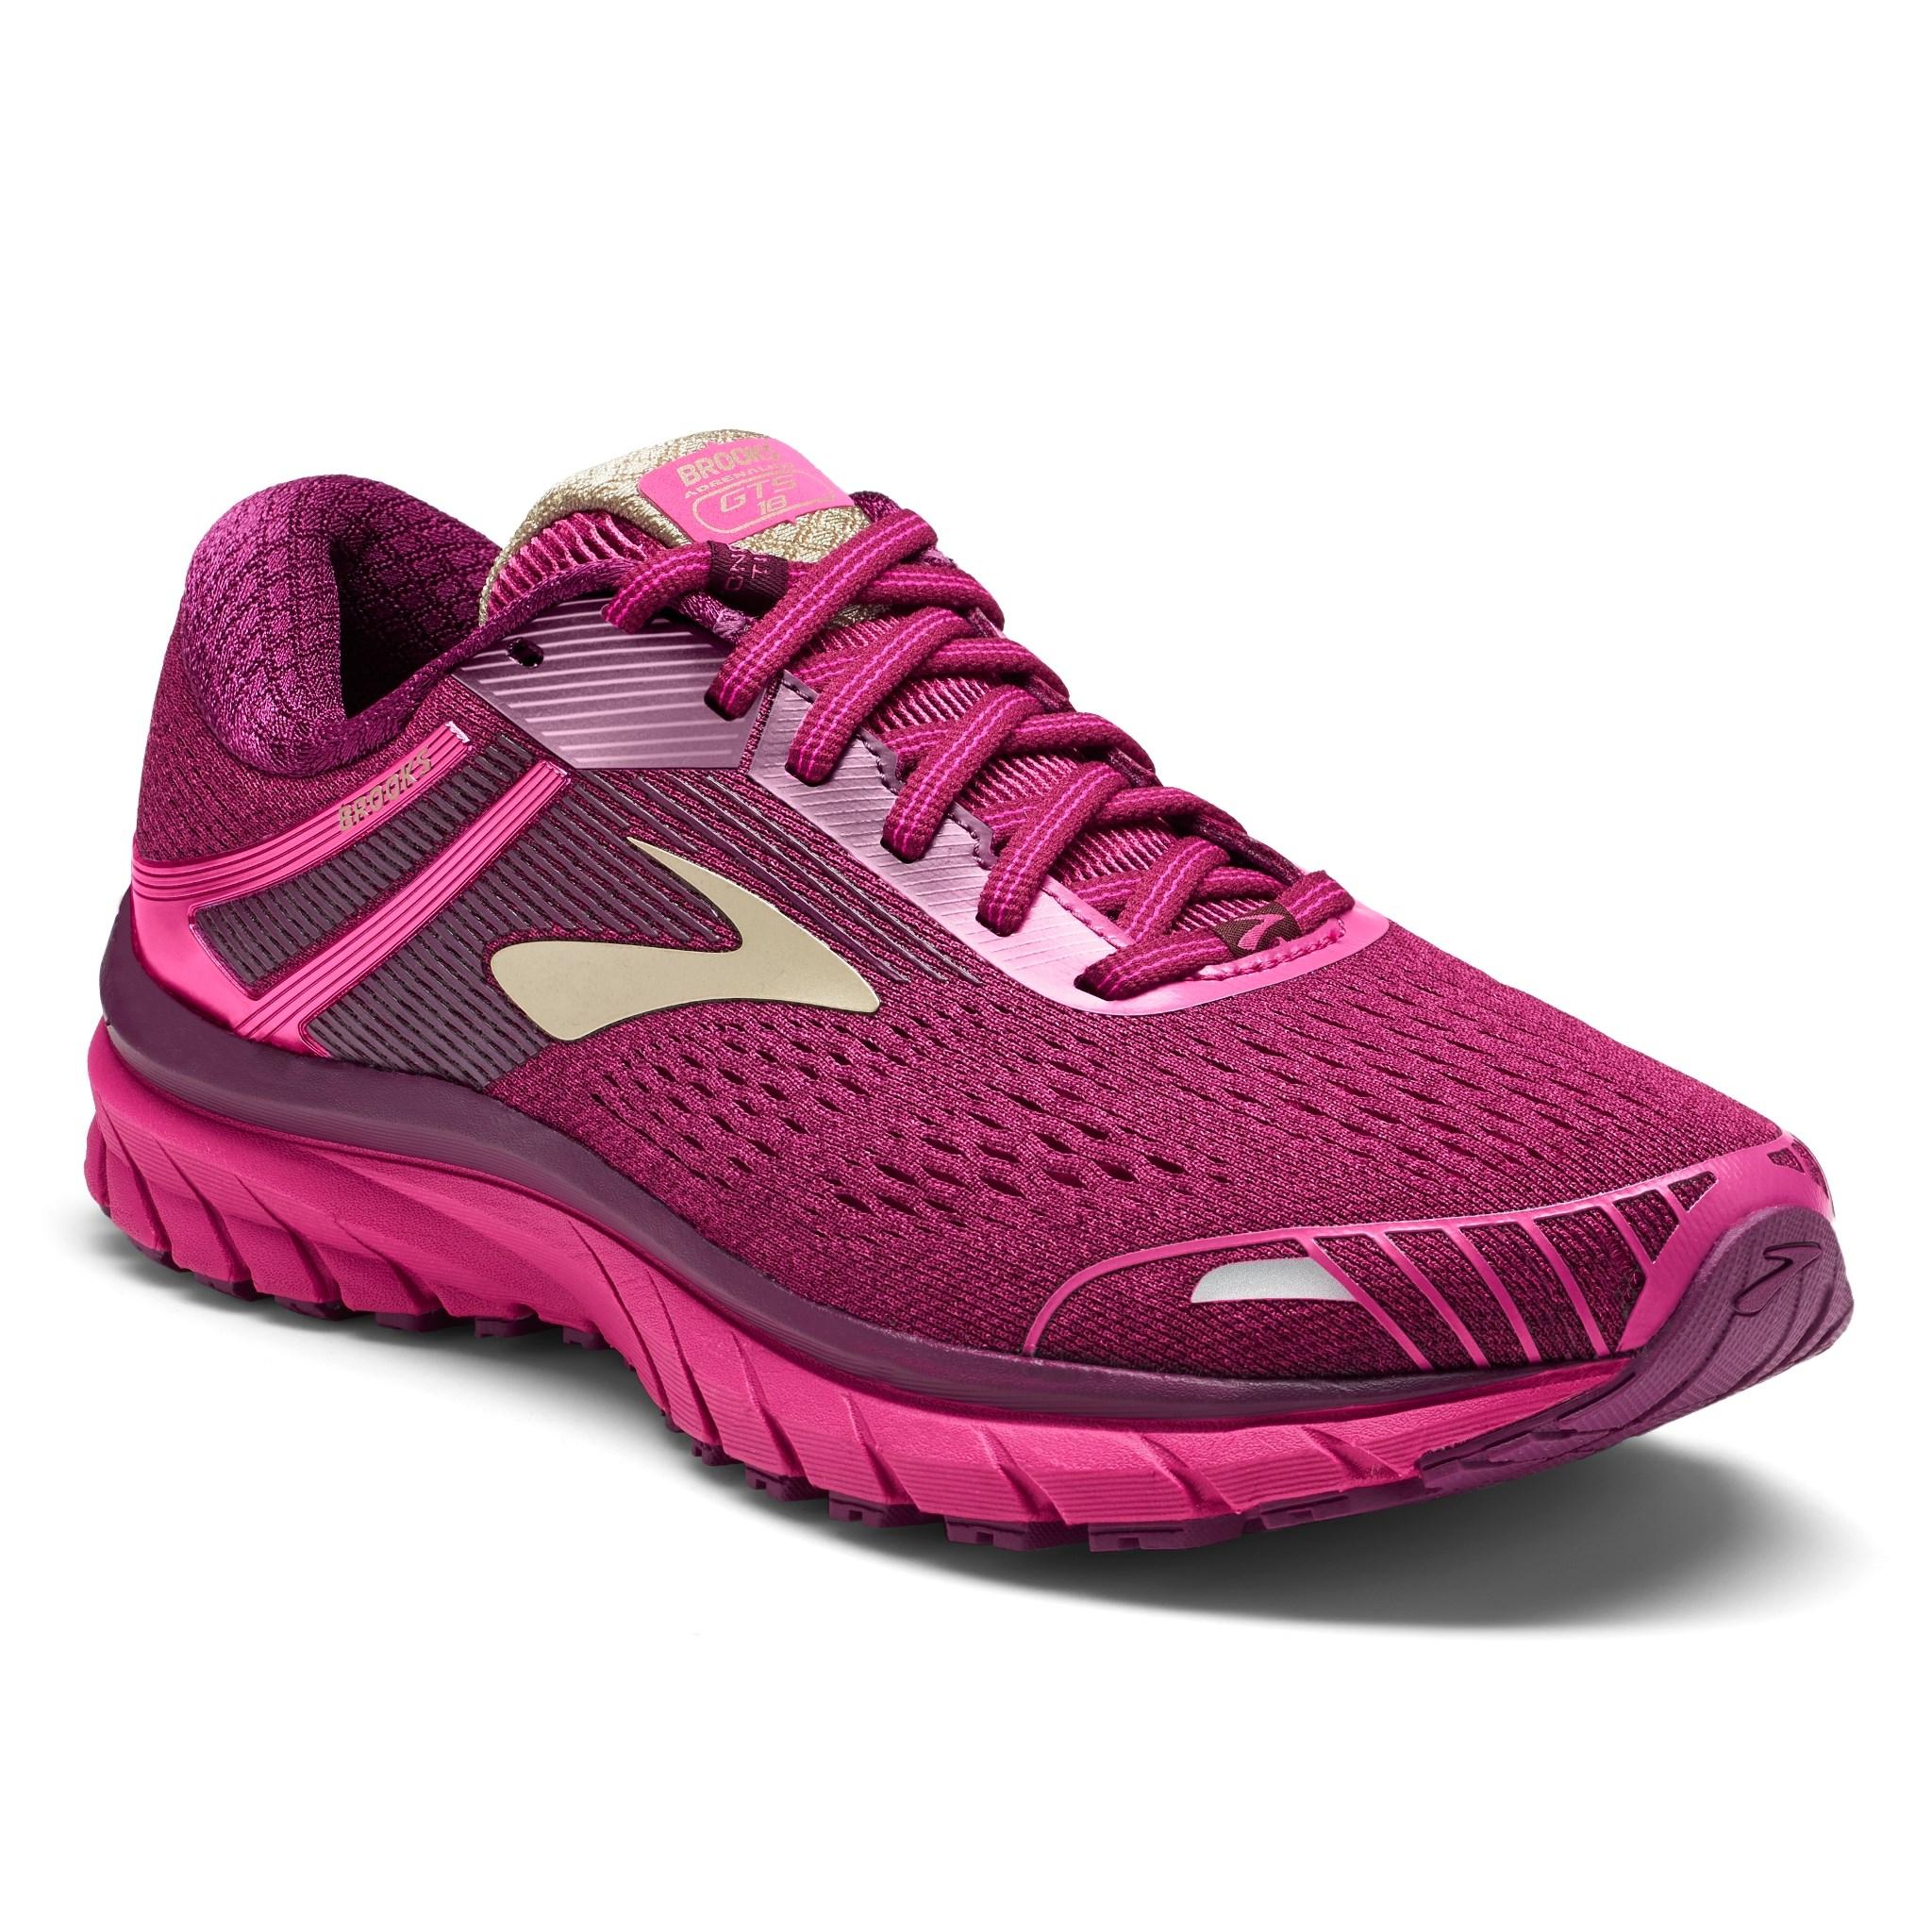 2b01cc5011d Details about Women s Brooks Adrenaline GTS 18 Running Shoe Pink Plum  Champagne